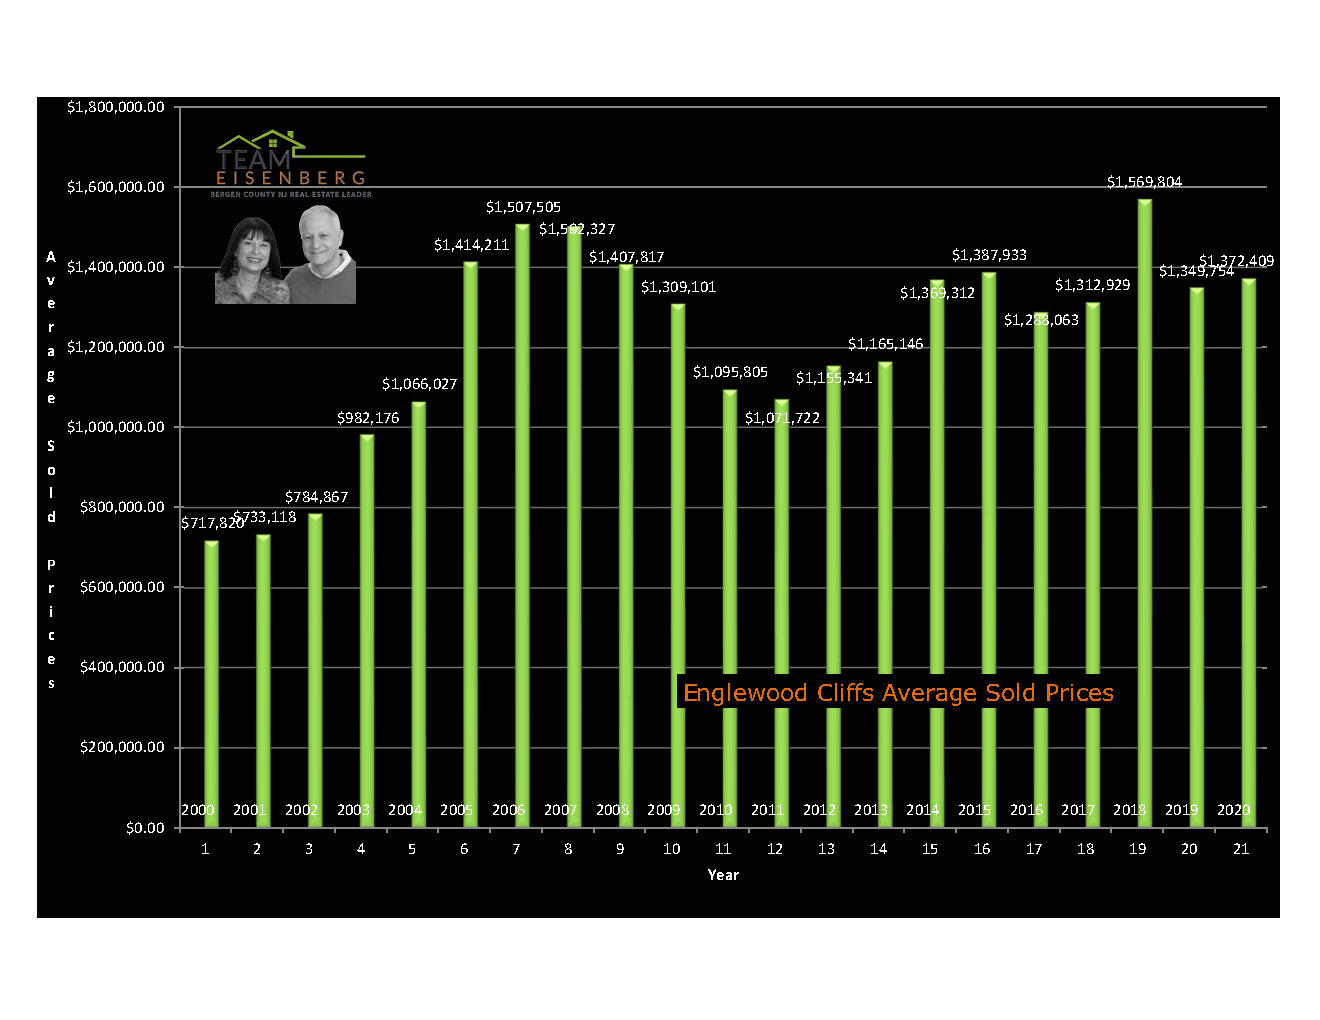 Englewood Cliffs | Average Sold Prices | 2000-2020